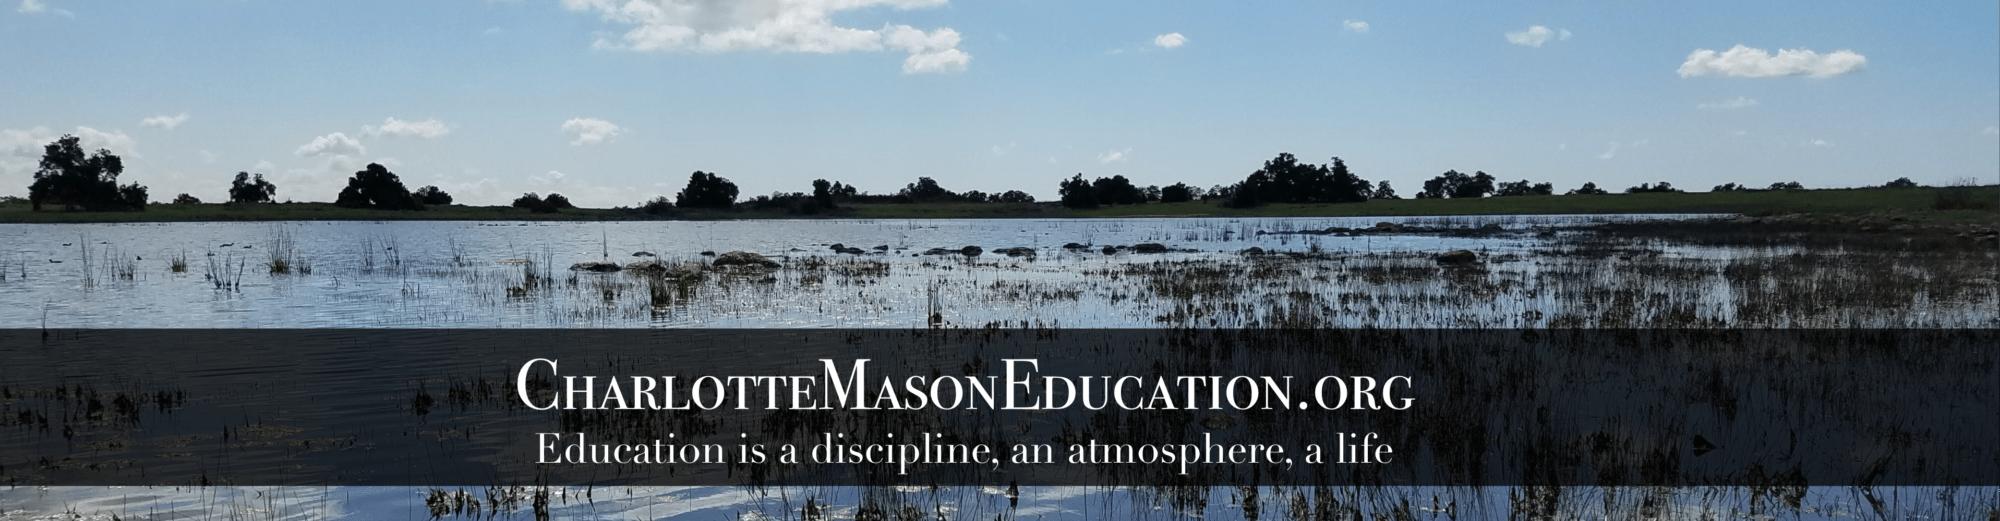 CharlotteMasonEducation.org